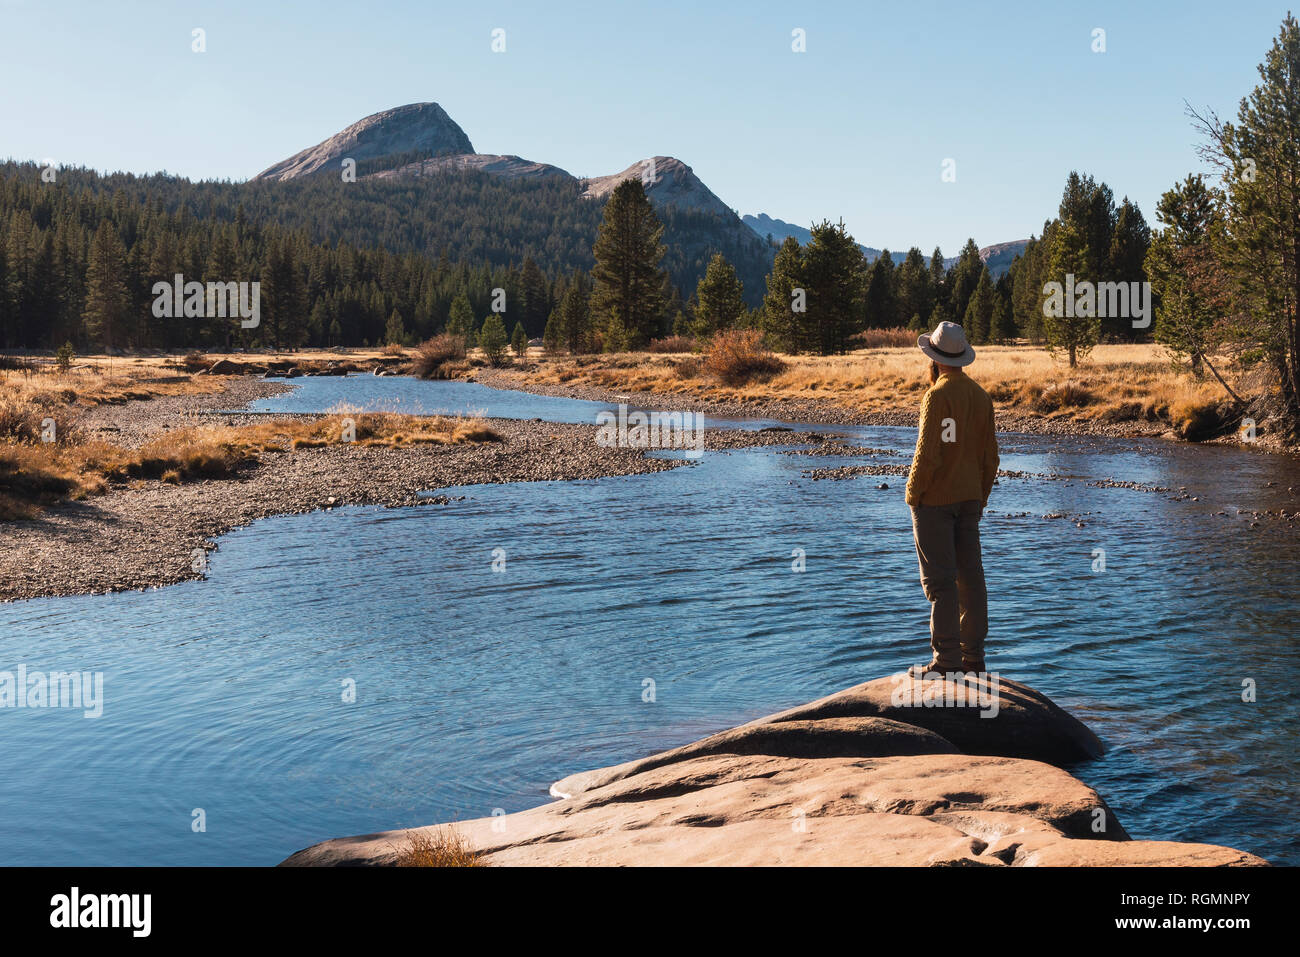 USA, California, Yosemite National Park, Tuolumne meadows, hiker on viewpoint - Stock Image